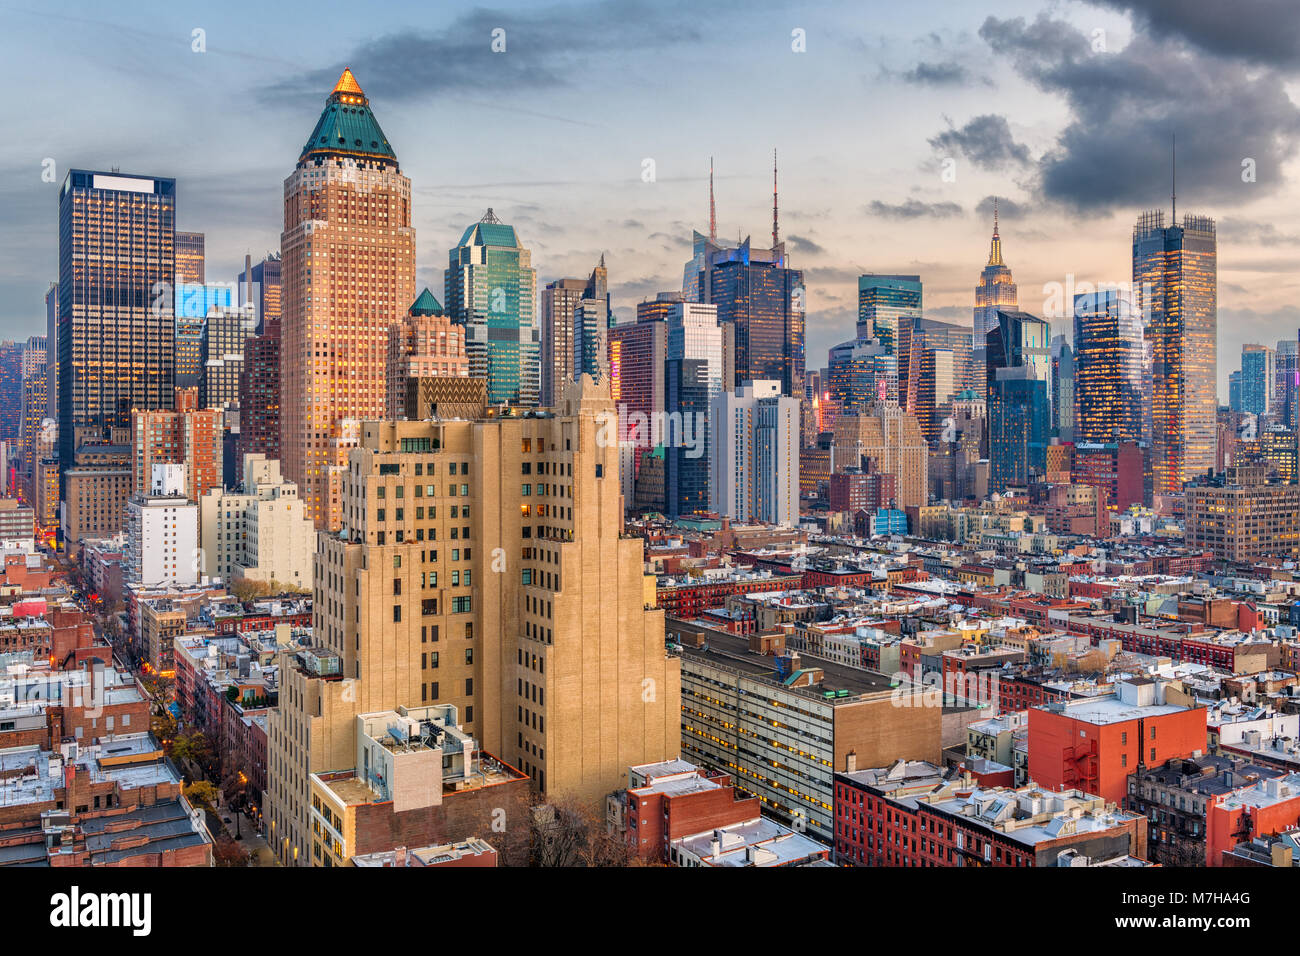 New York, New York, Stati Uniti d'America midtown skyline di Manhattan su Hell's Kitchen all'alba. Immagini Stock